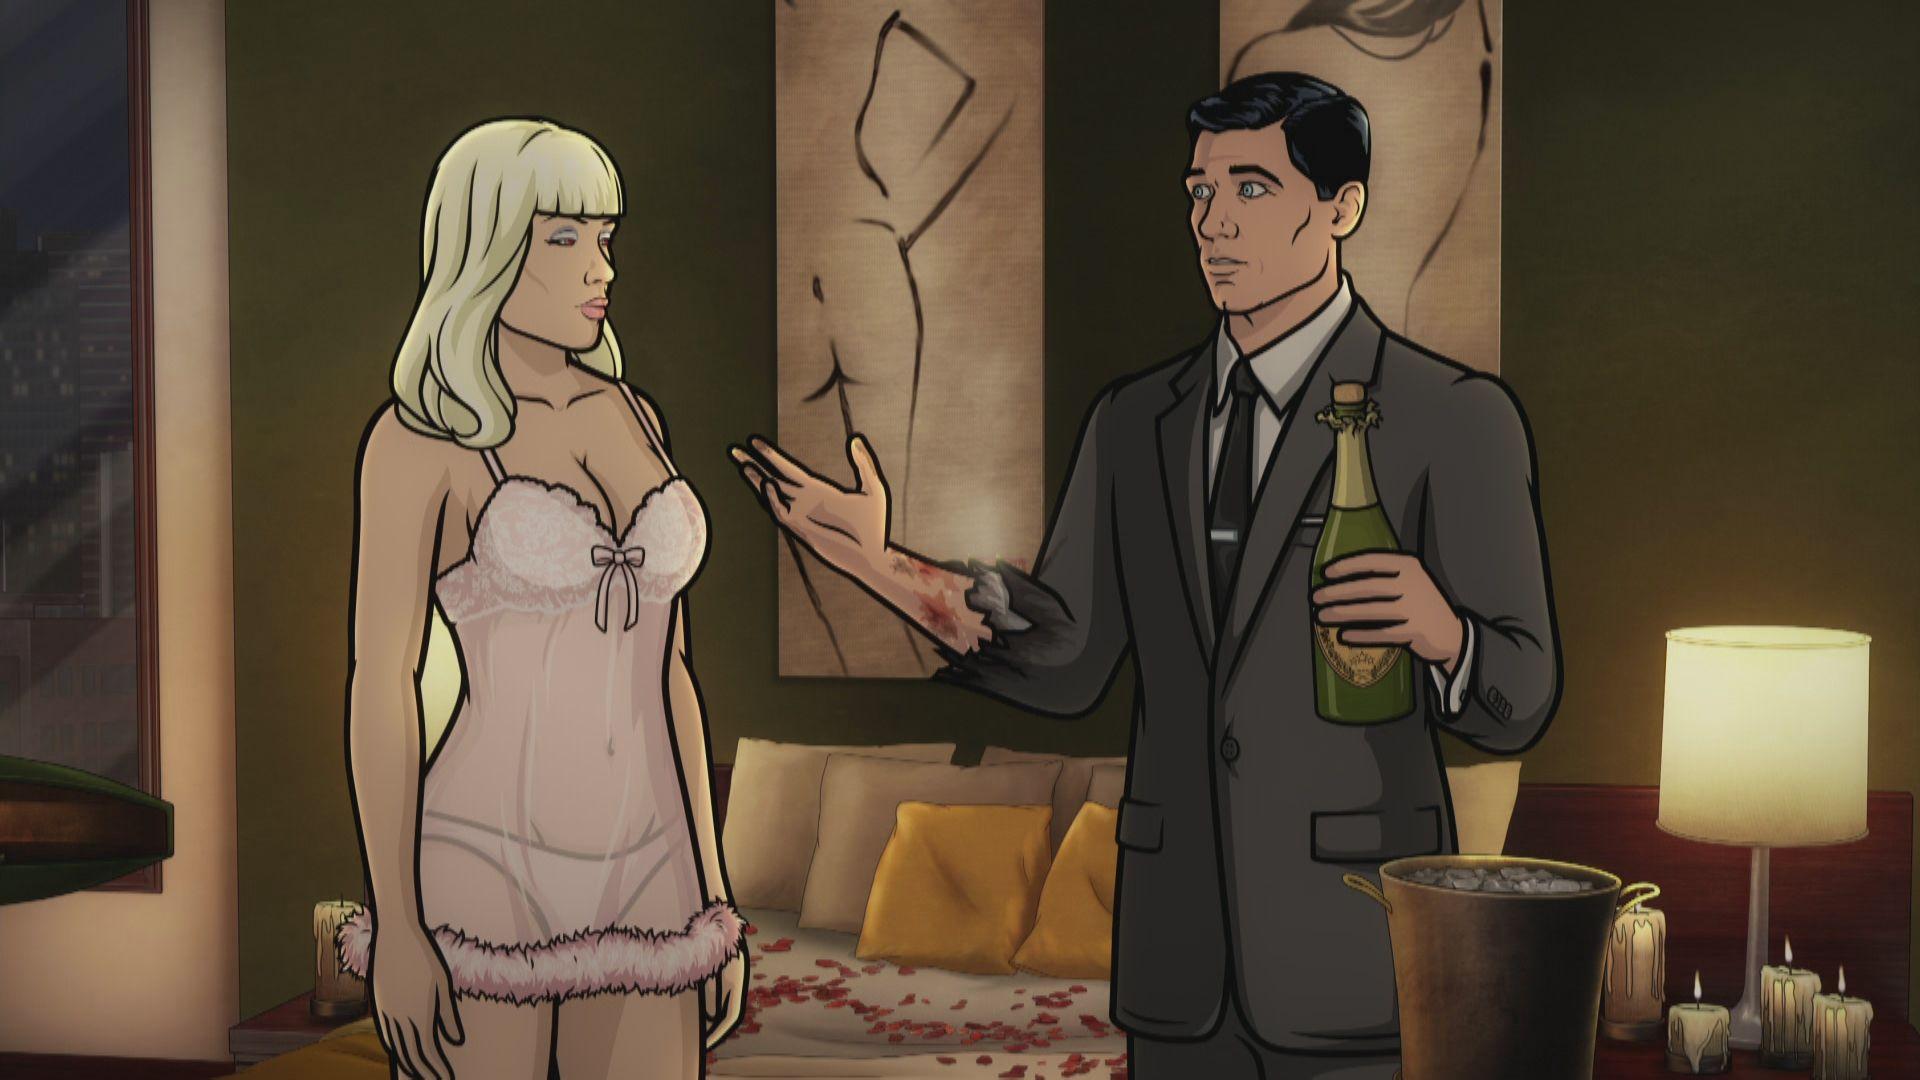 Cheryl tunt archer hentai pornos image